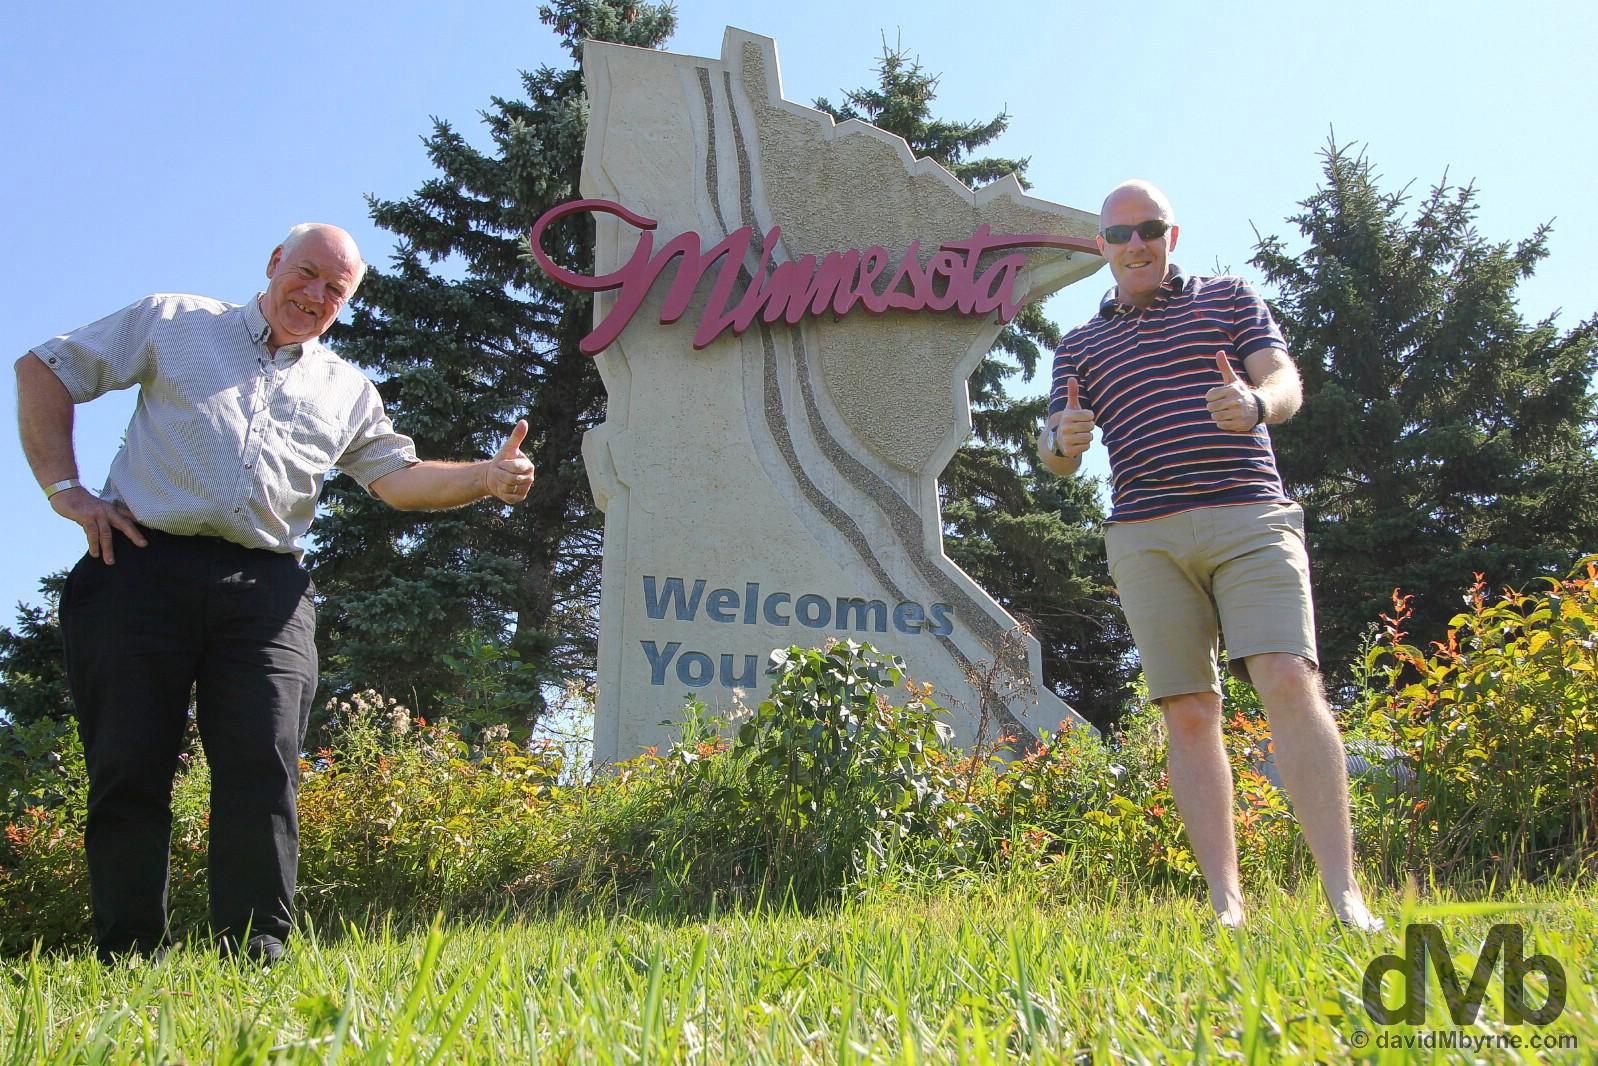 Minnesota Welcomes You. Grand Forks, South Dakota. August 31, 2016.